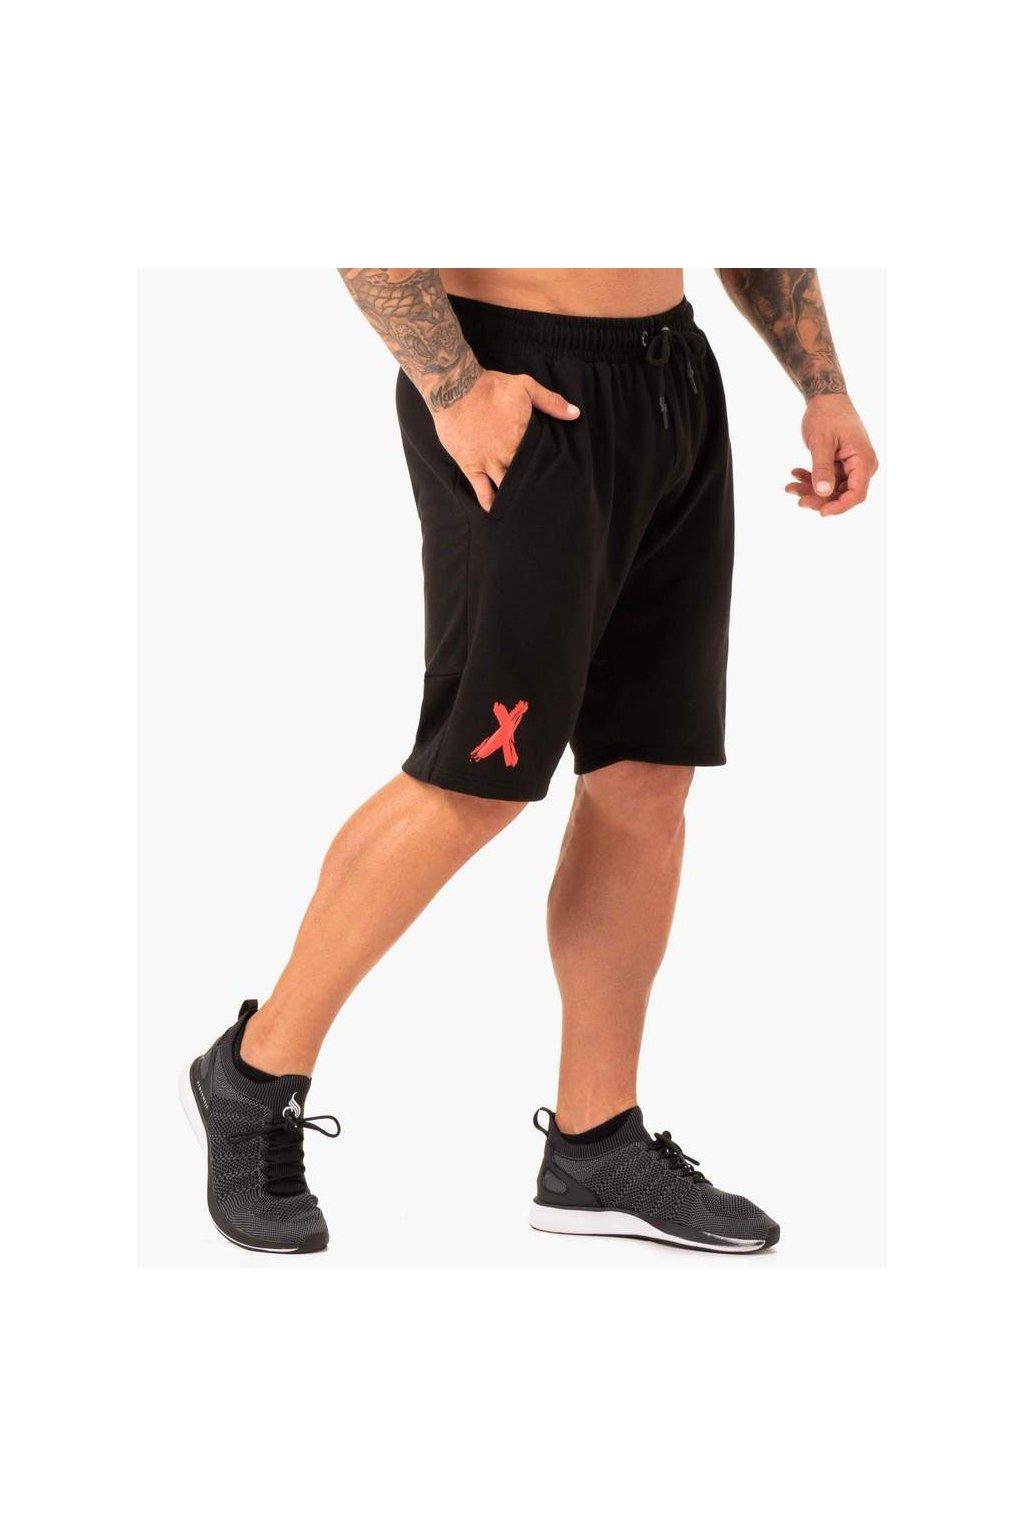 rwxkg track shorts black clothing ryderwear 344658 1000x1000